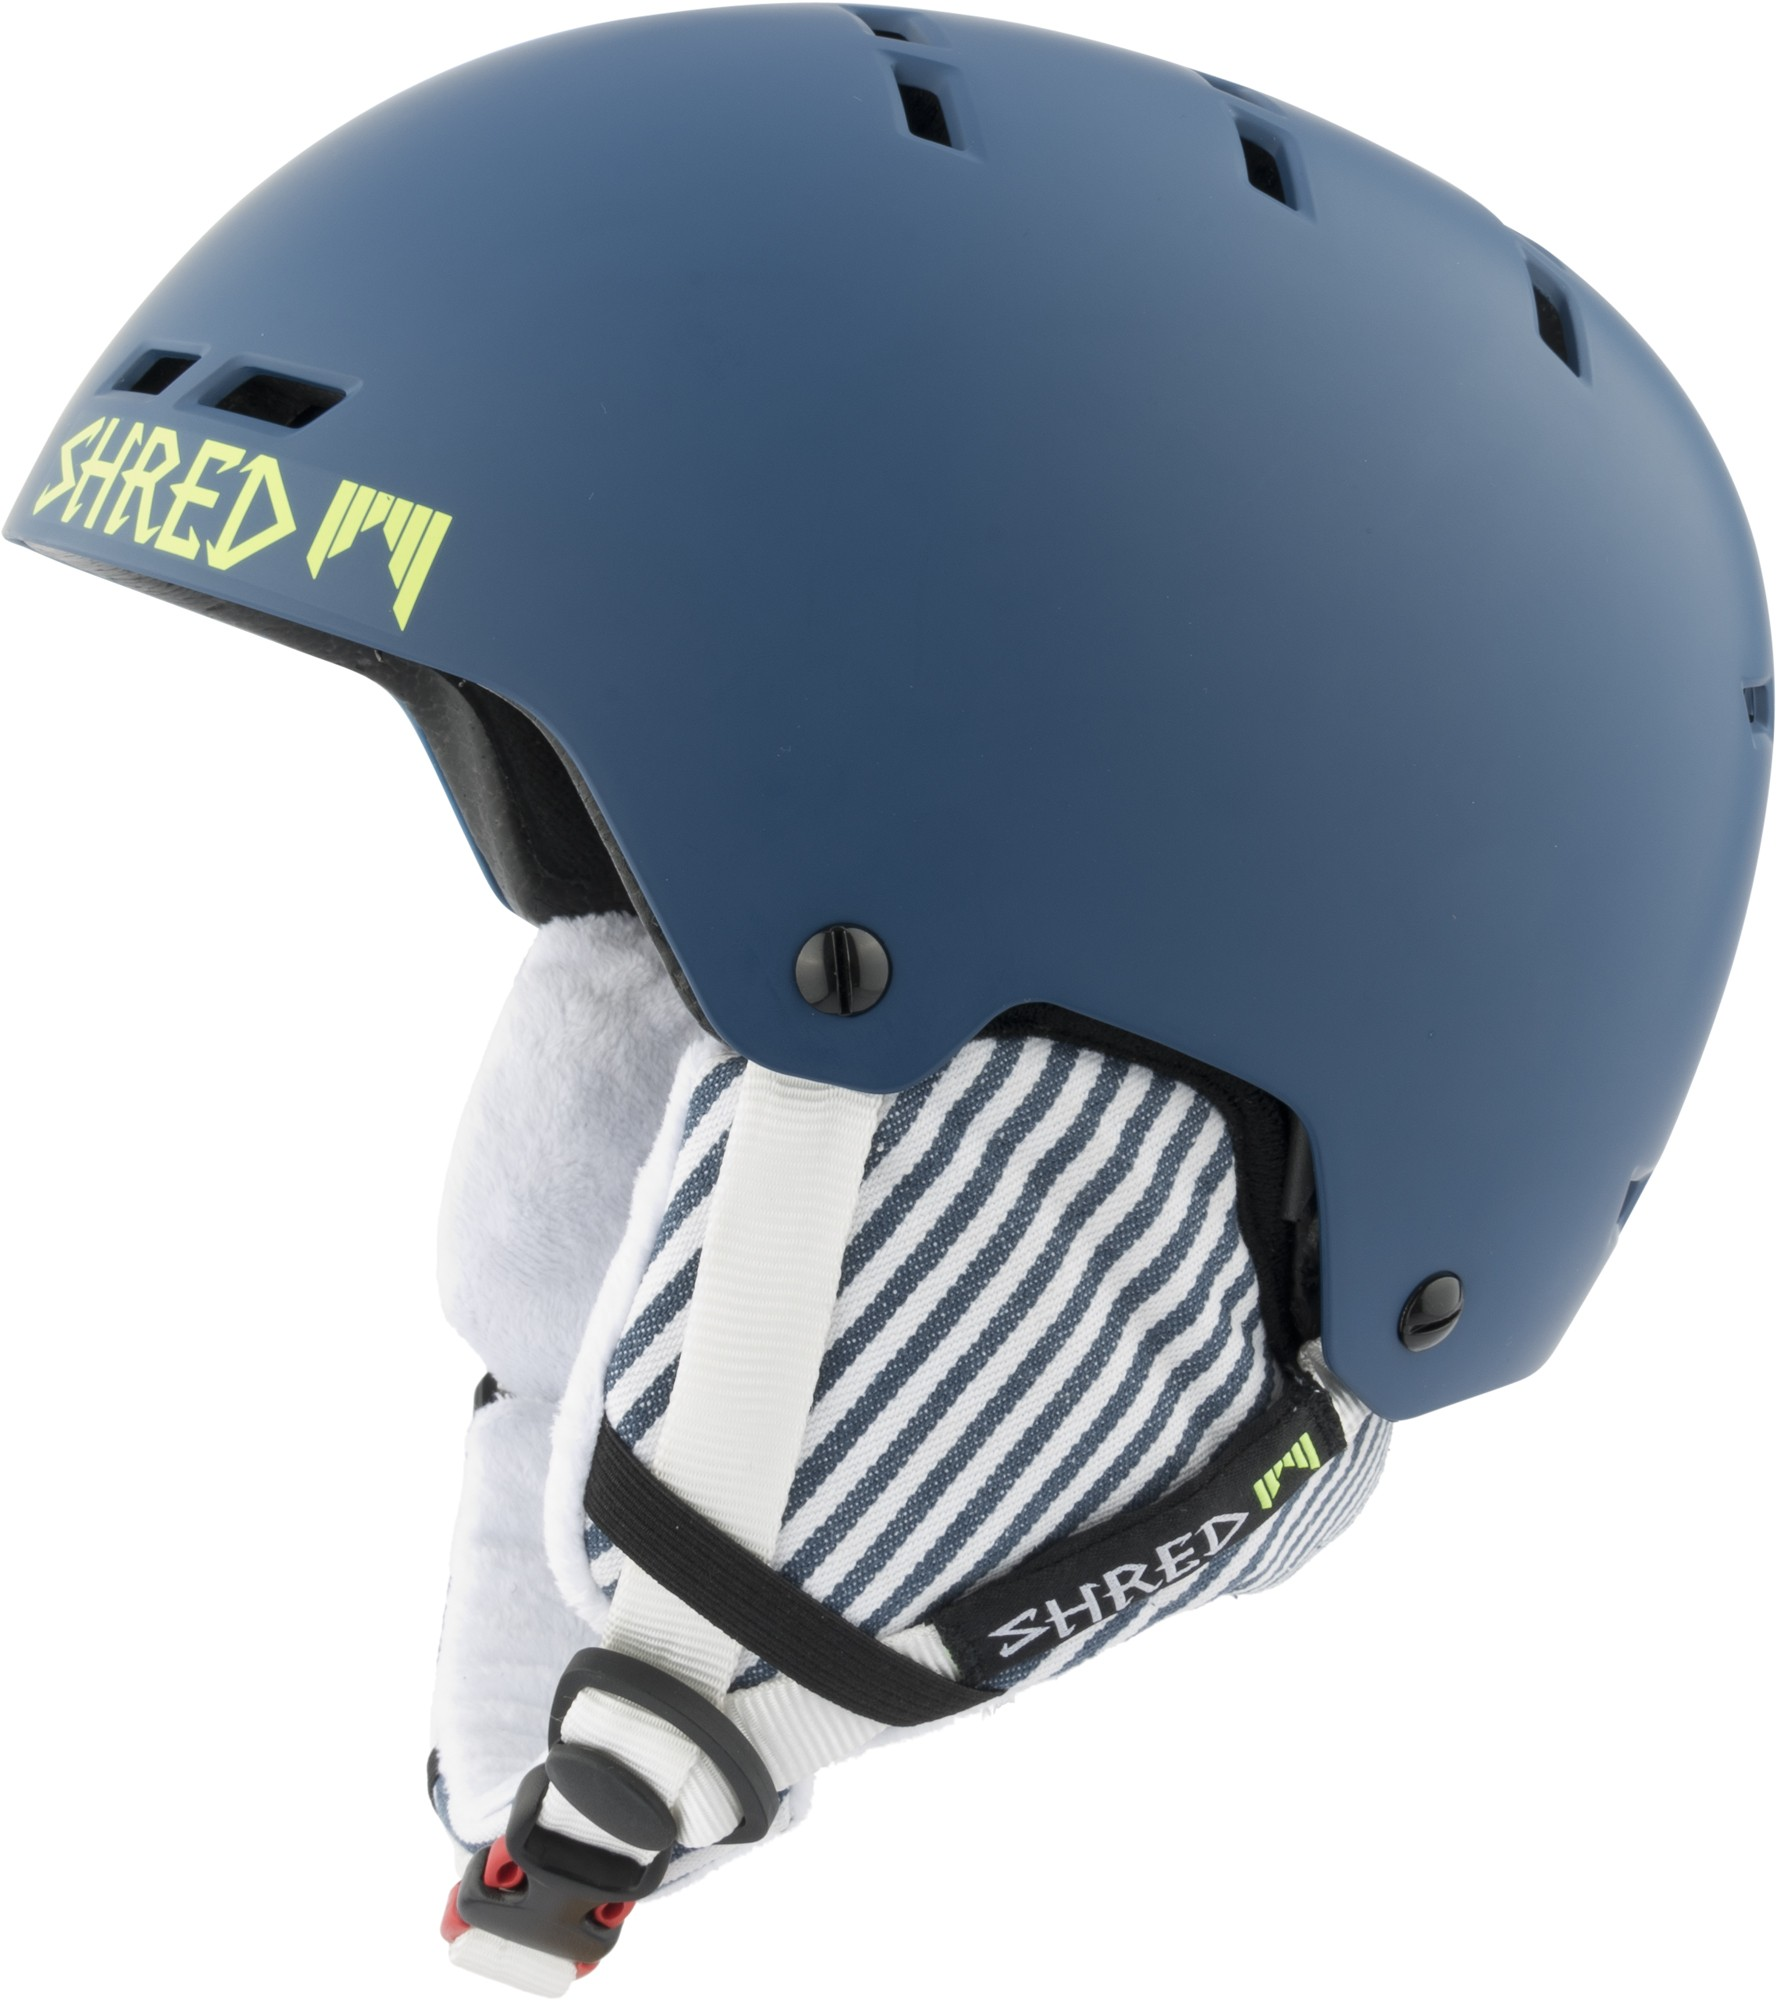 Shred BUMPER NoShock warm PAJAMA ski helmet, 2017